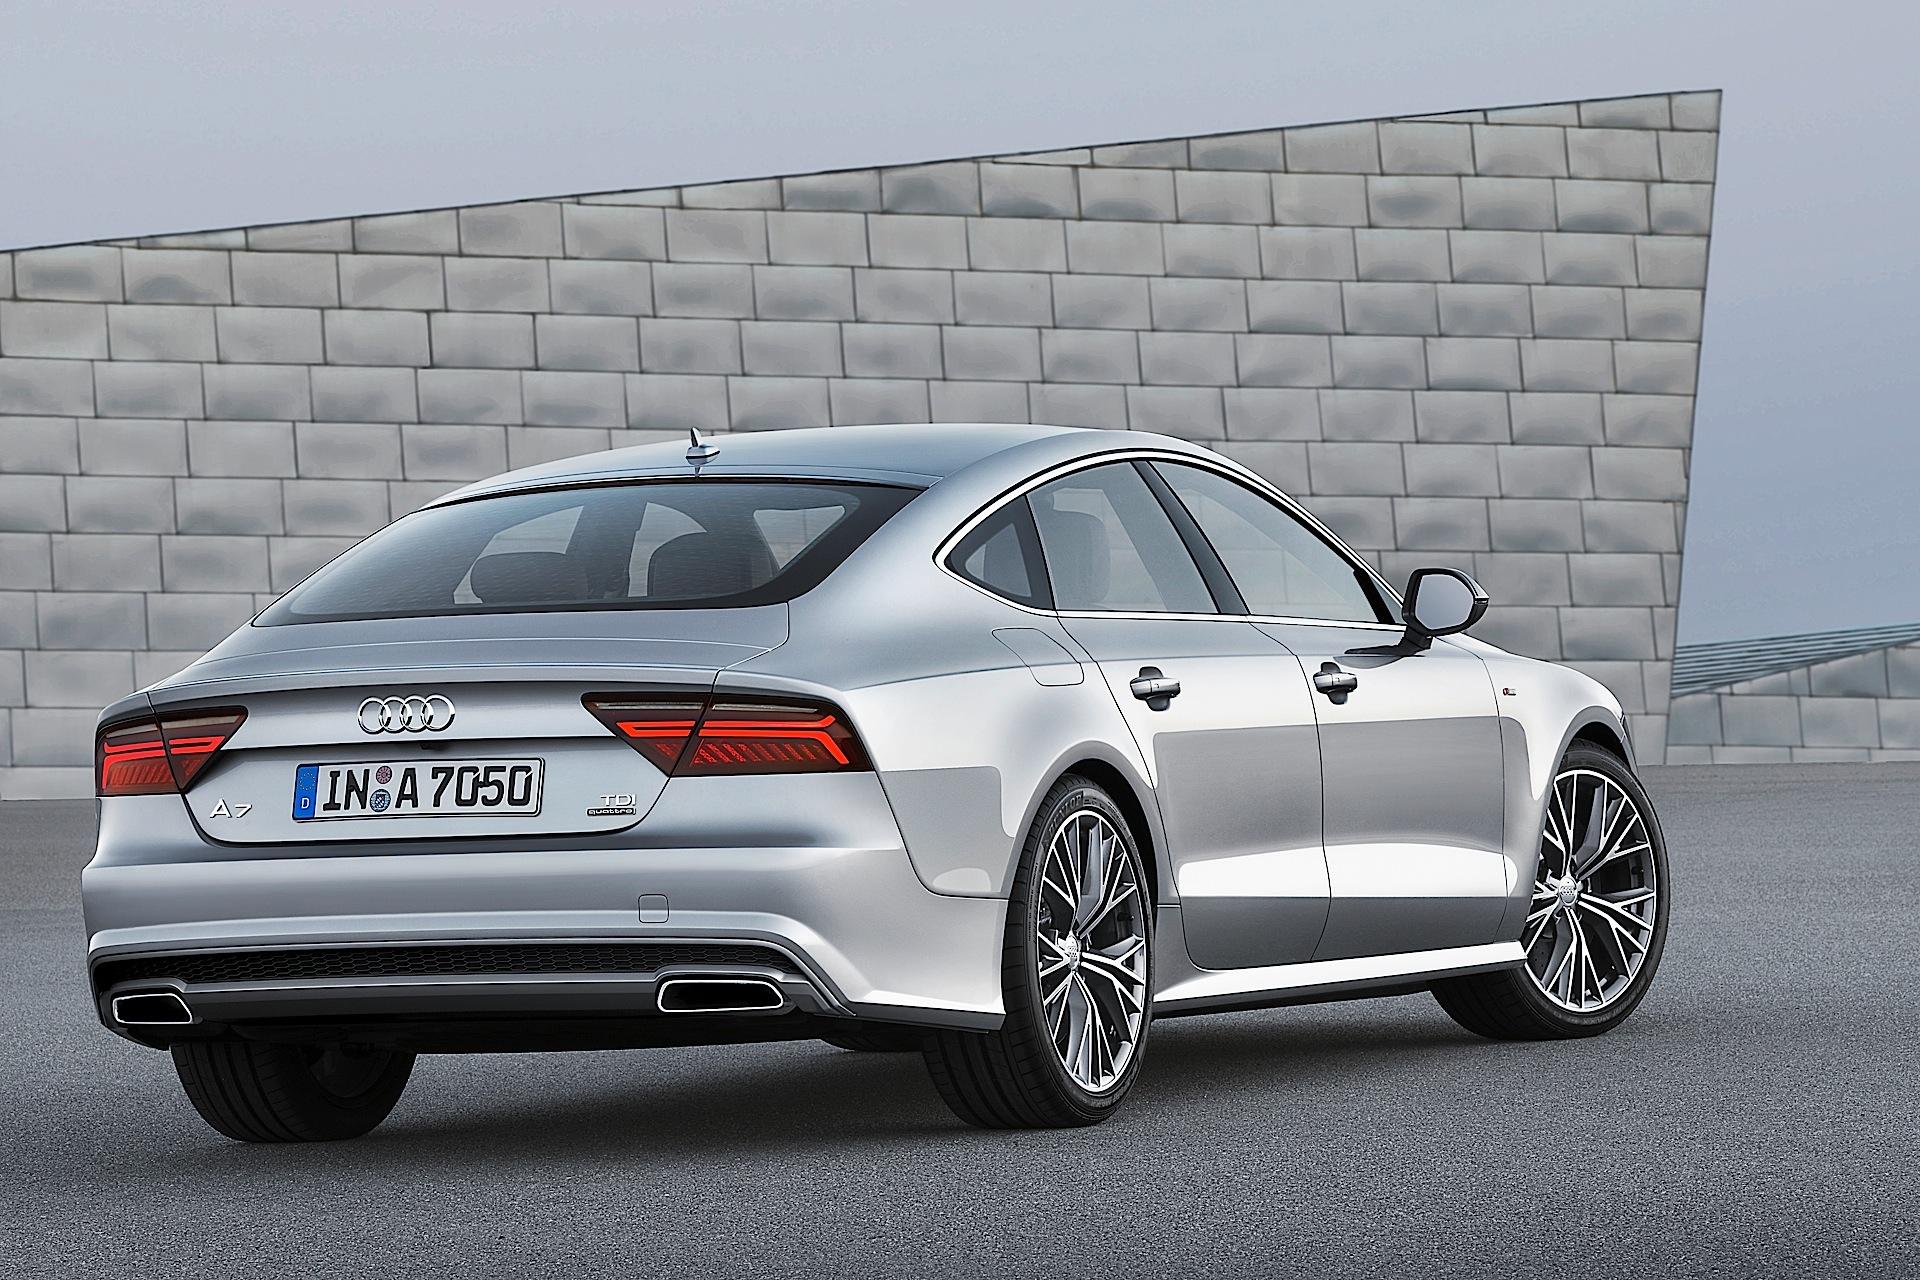 Kelebihan Kekurangan Audi A7 2017 Murah Berkualitas